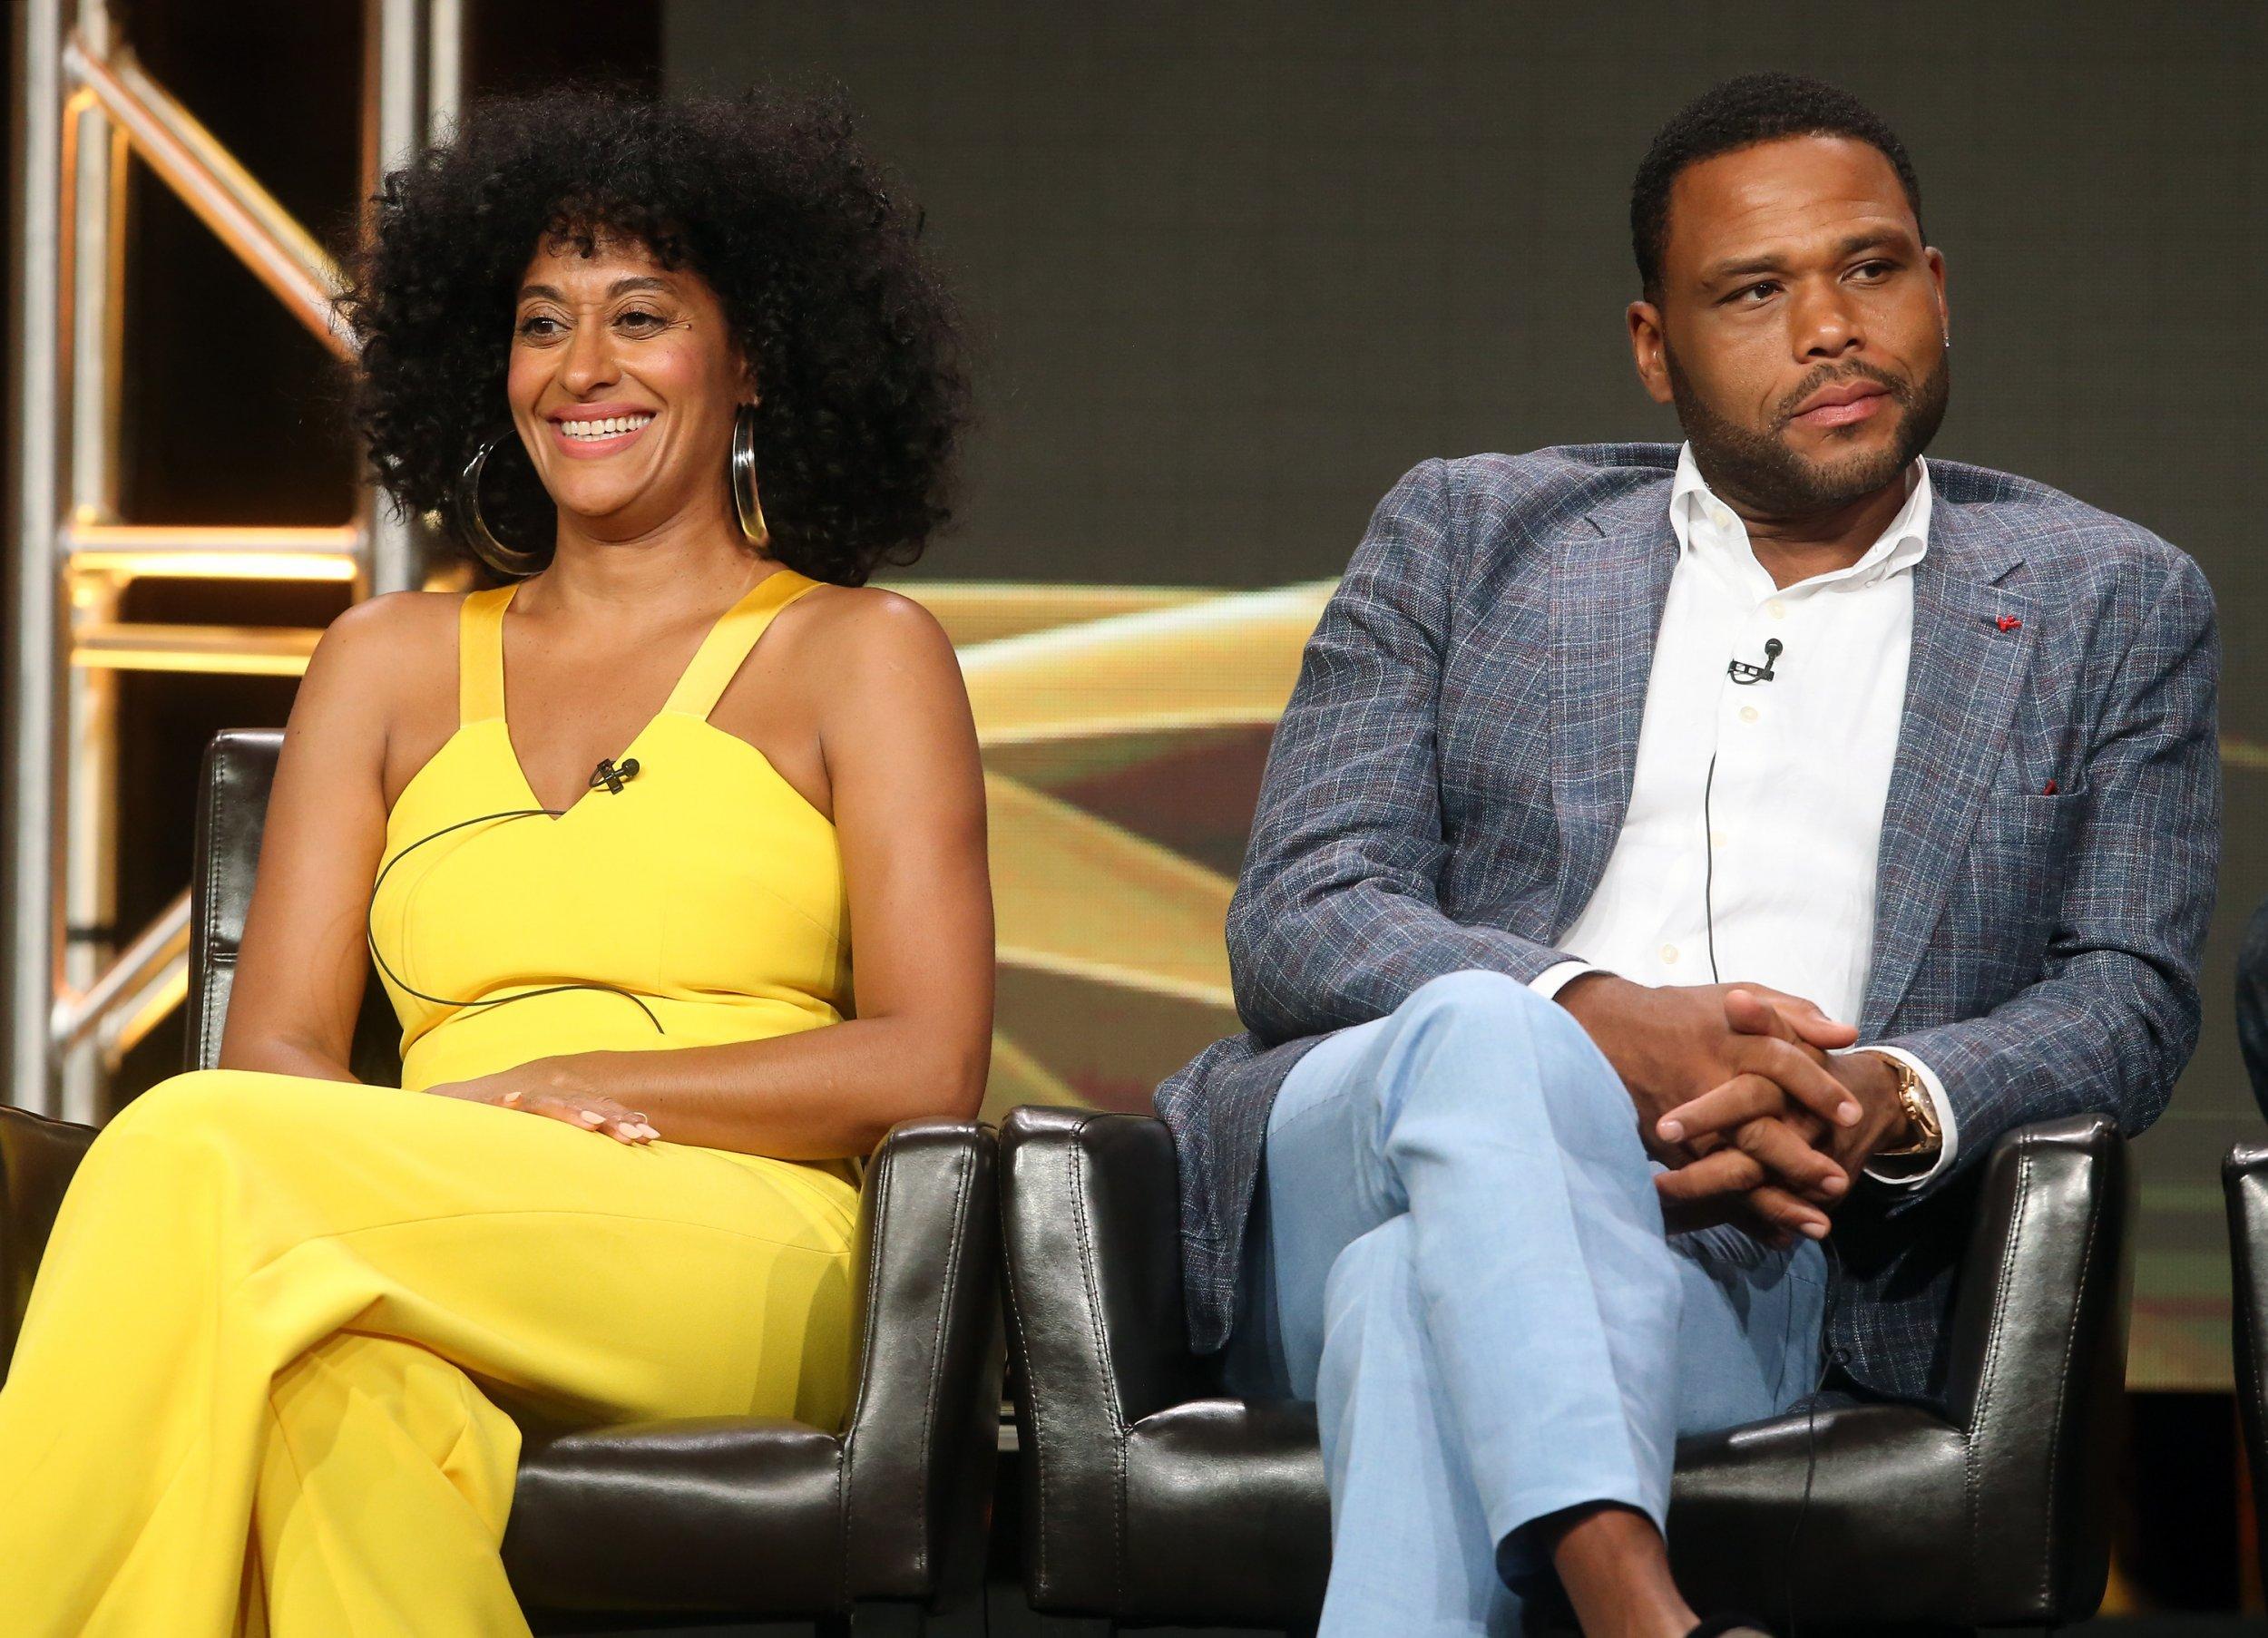 TV Star Salaries Reveal Pay Gap Between White and Minority